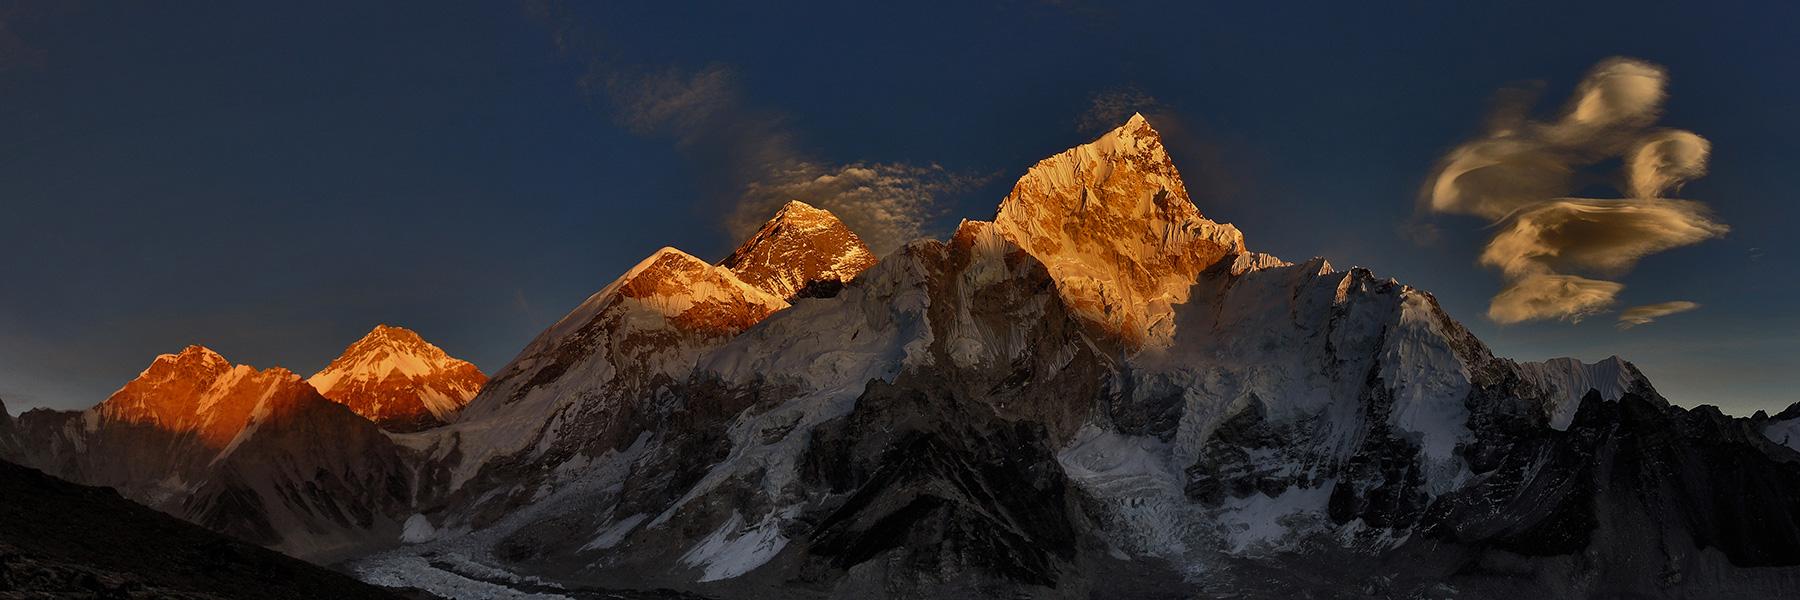 Nepal-Dec-2015-0592-pan-18x6